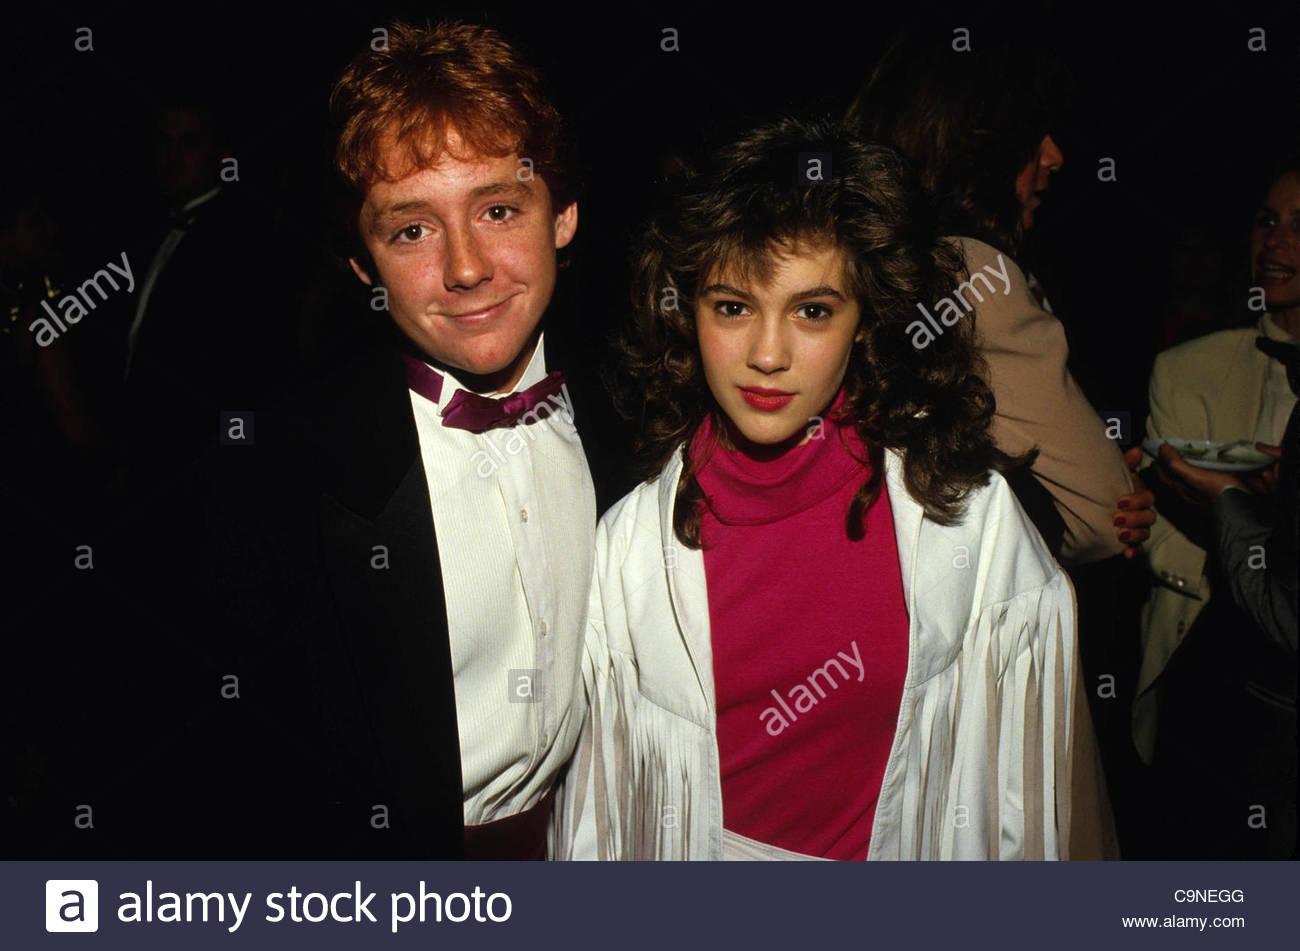 Alphy Hoffman Corey >> Jan. 28, 1987 - Hollywood, California, U.S. - F3745.ALYSSA MILANO Stock Photo, Royalty Free ...